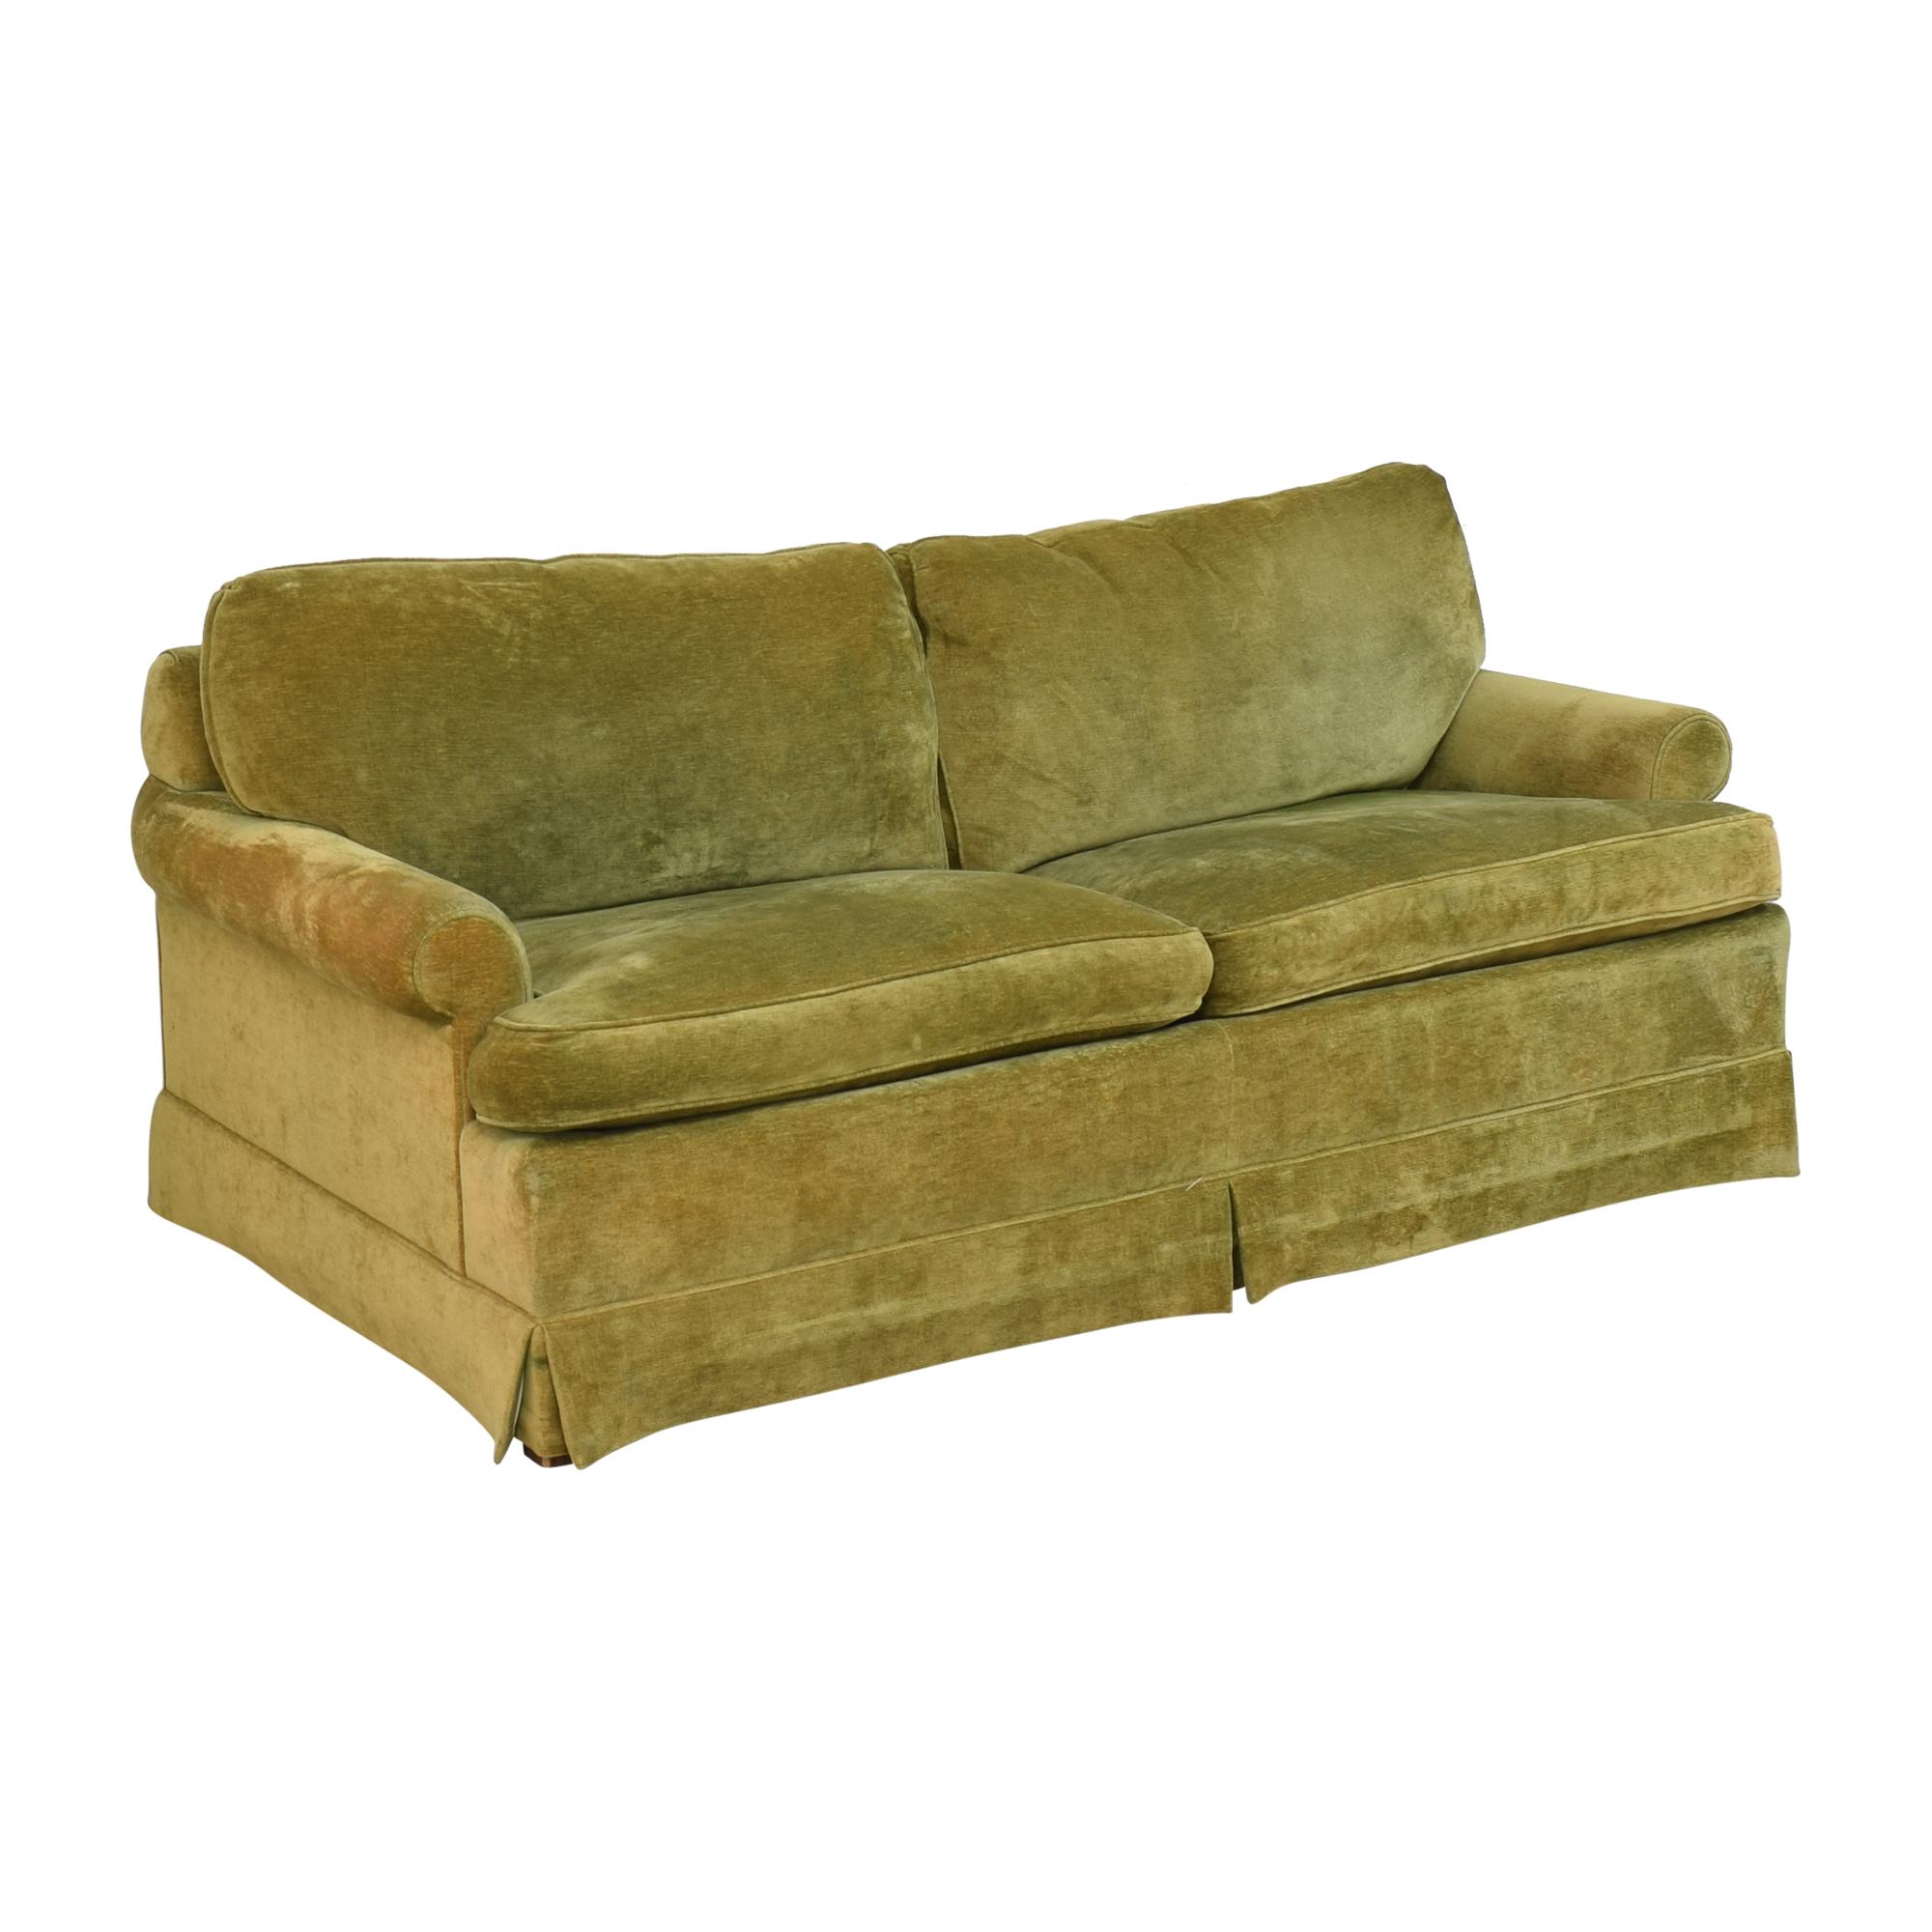 Hickory Springs Hickory Springs Two Cushion Sleeper Sofa green